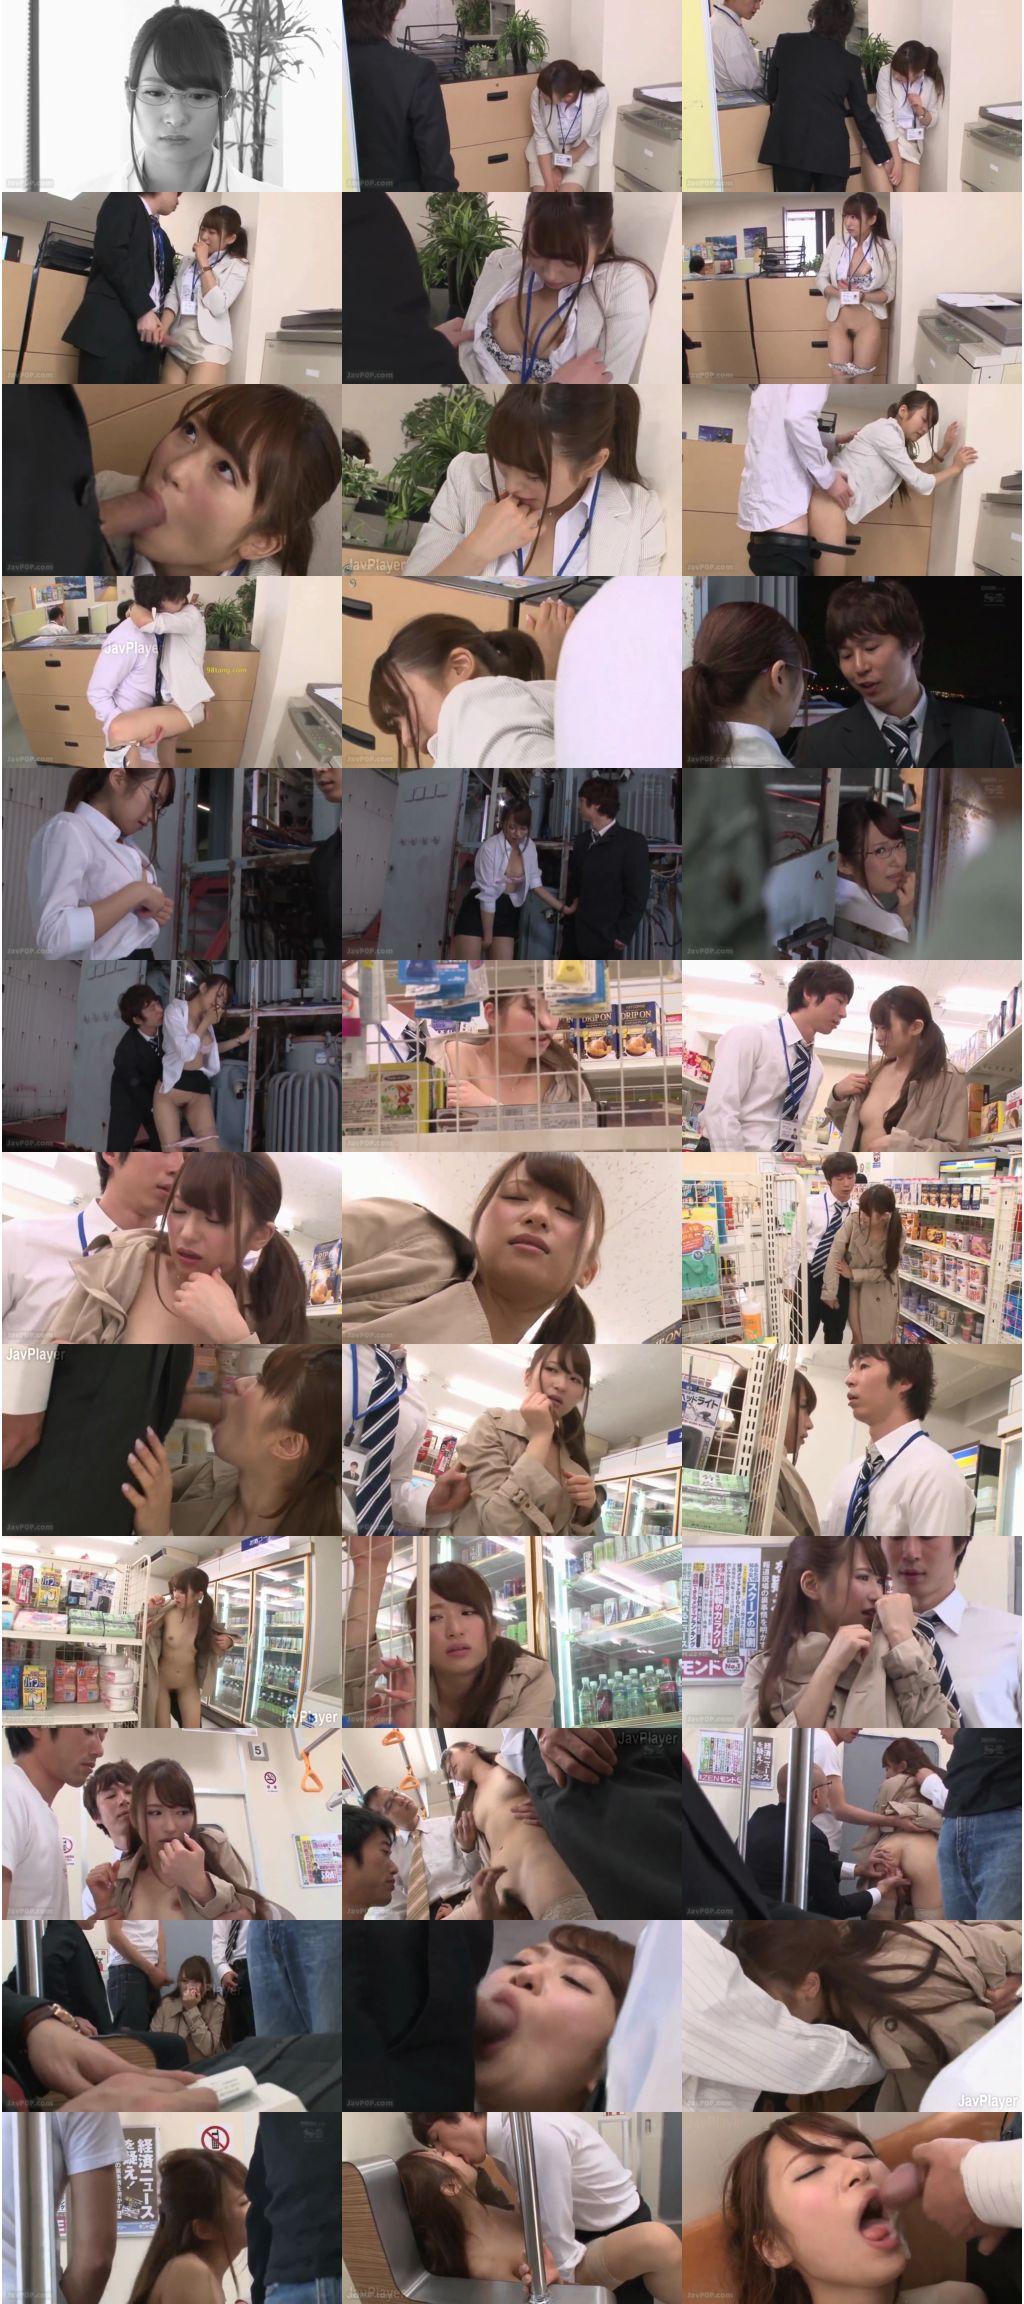 snis 532 s - [SNIS-532] いいなり公然わいせつ 緒川りお Kyousei Ogawa Rio キョウセイ 巨乳 Humiliation